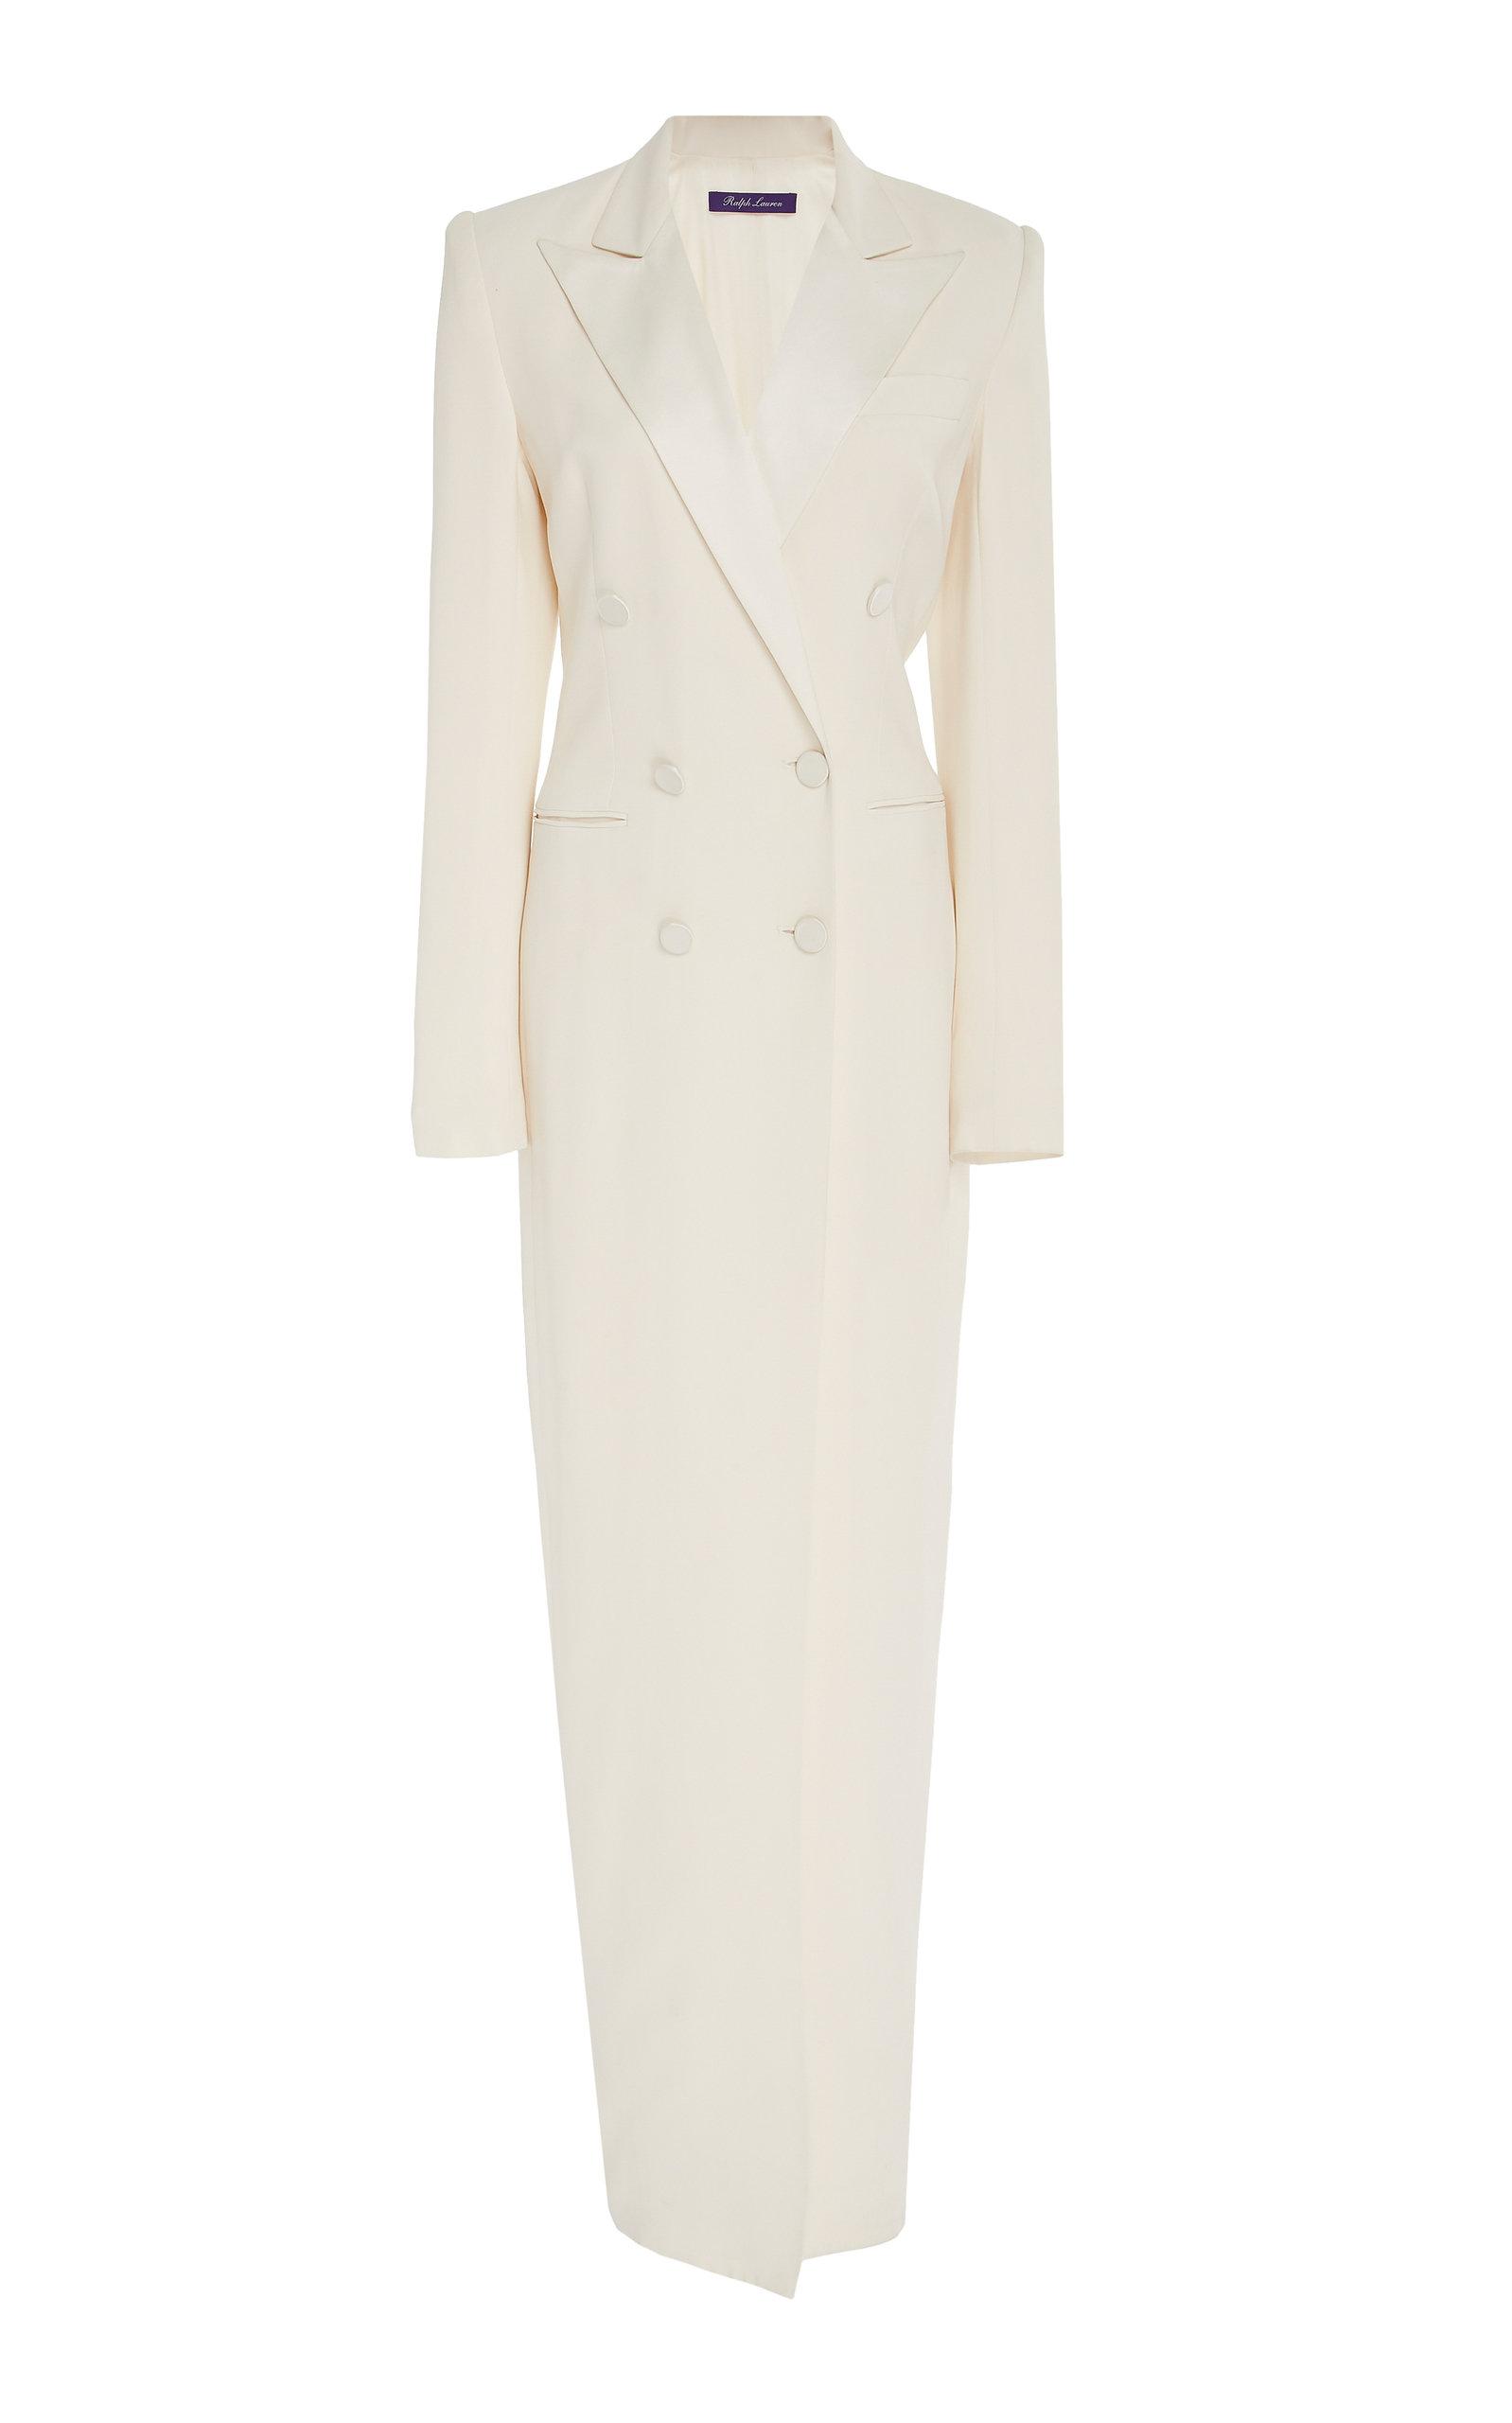 Ralph Lauren Silks KRISTIAN DOUBLE-BREASTED SILK DRESS